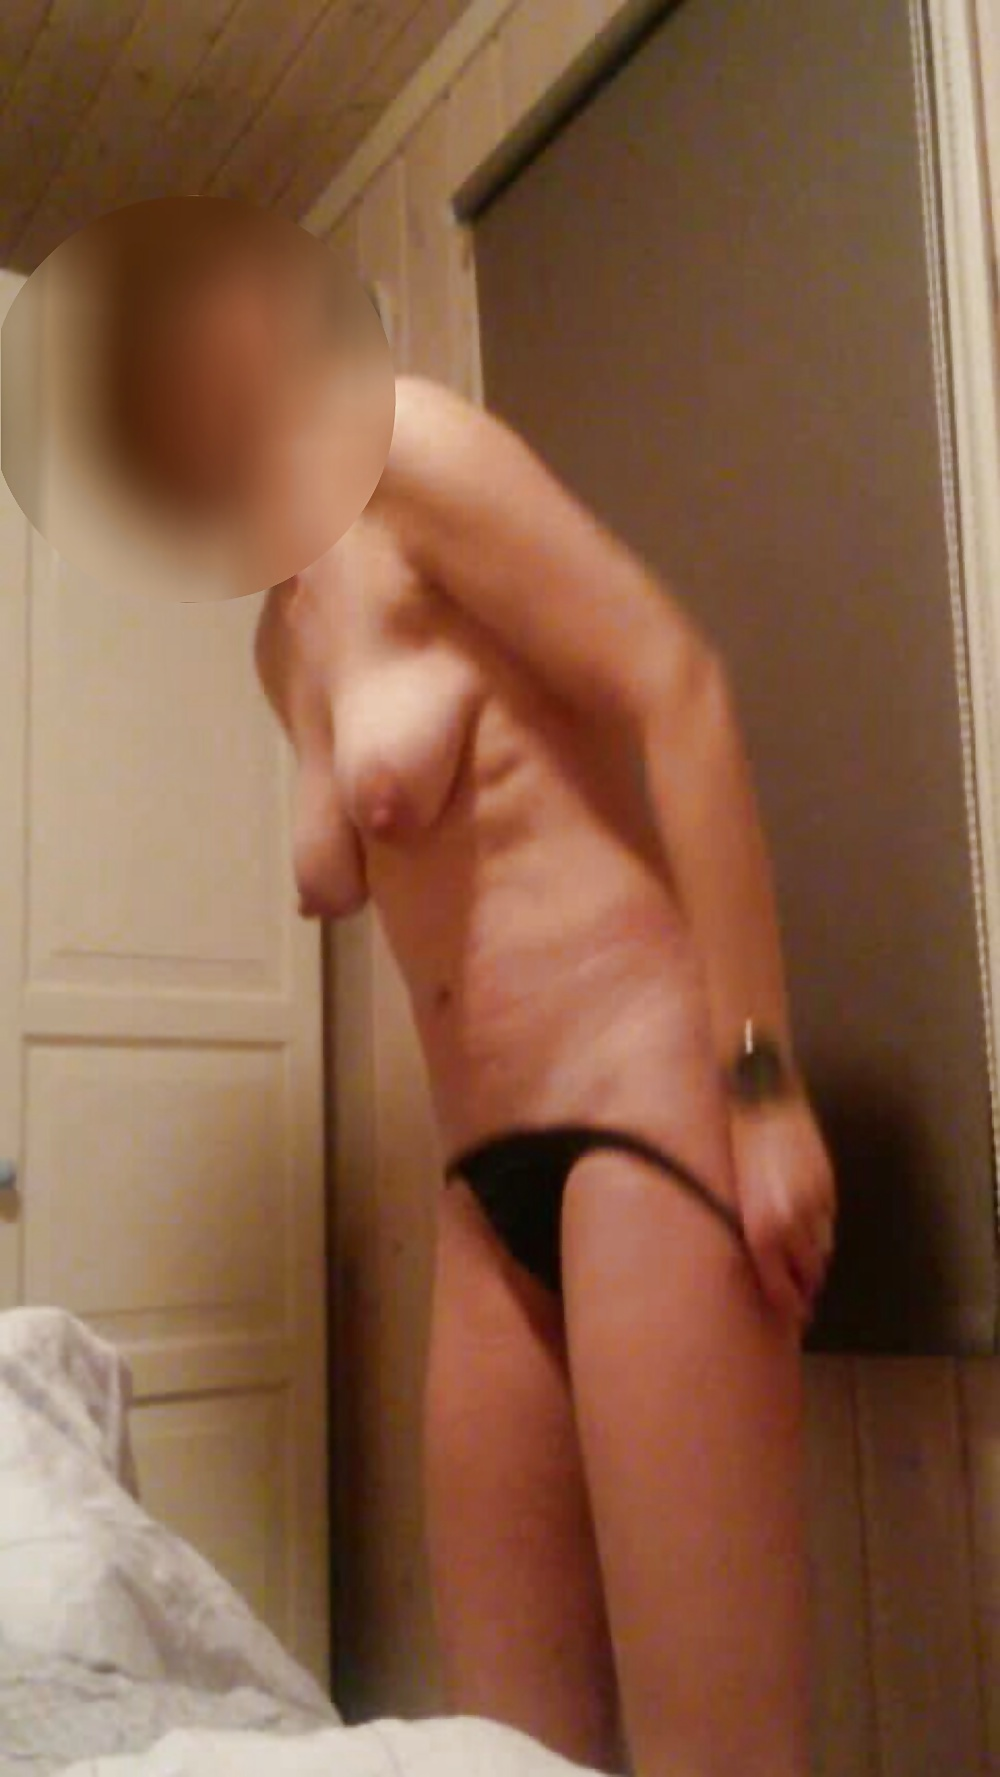 Girls undressing for camera-9424